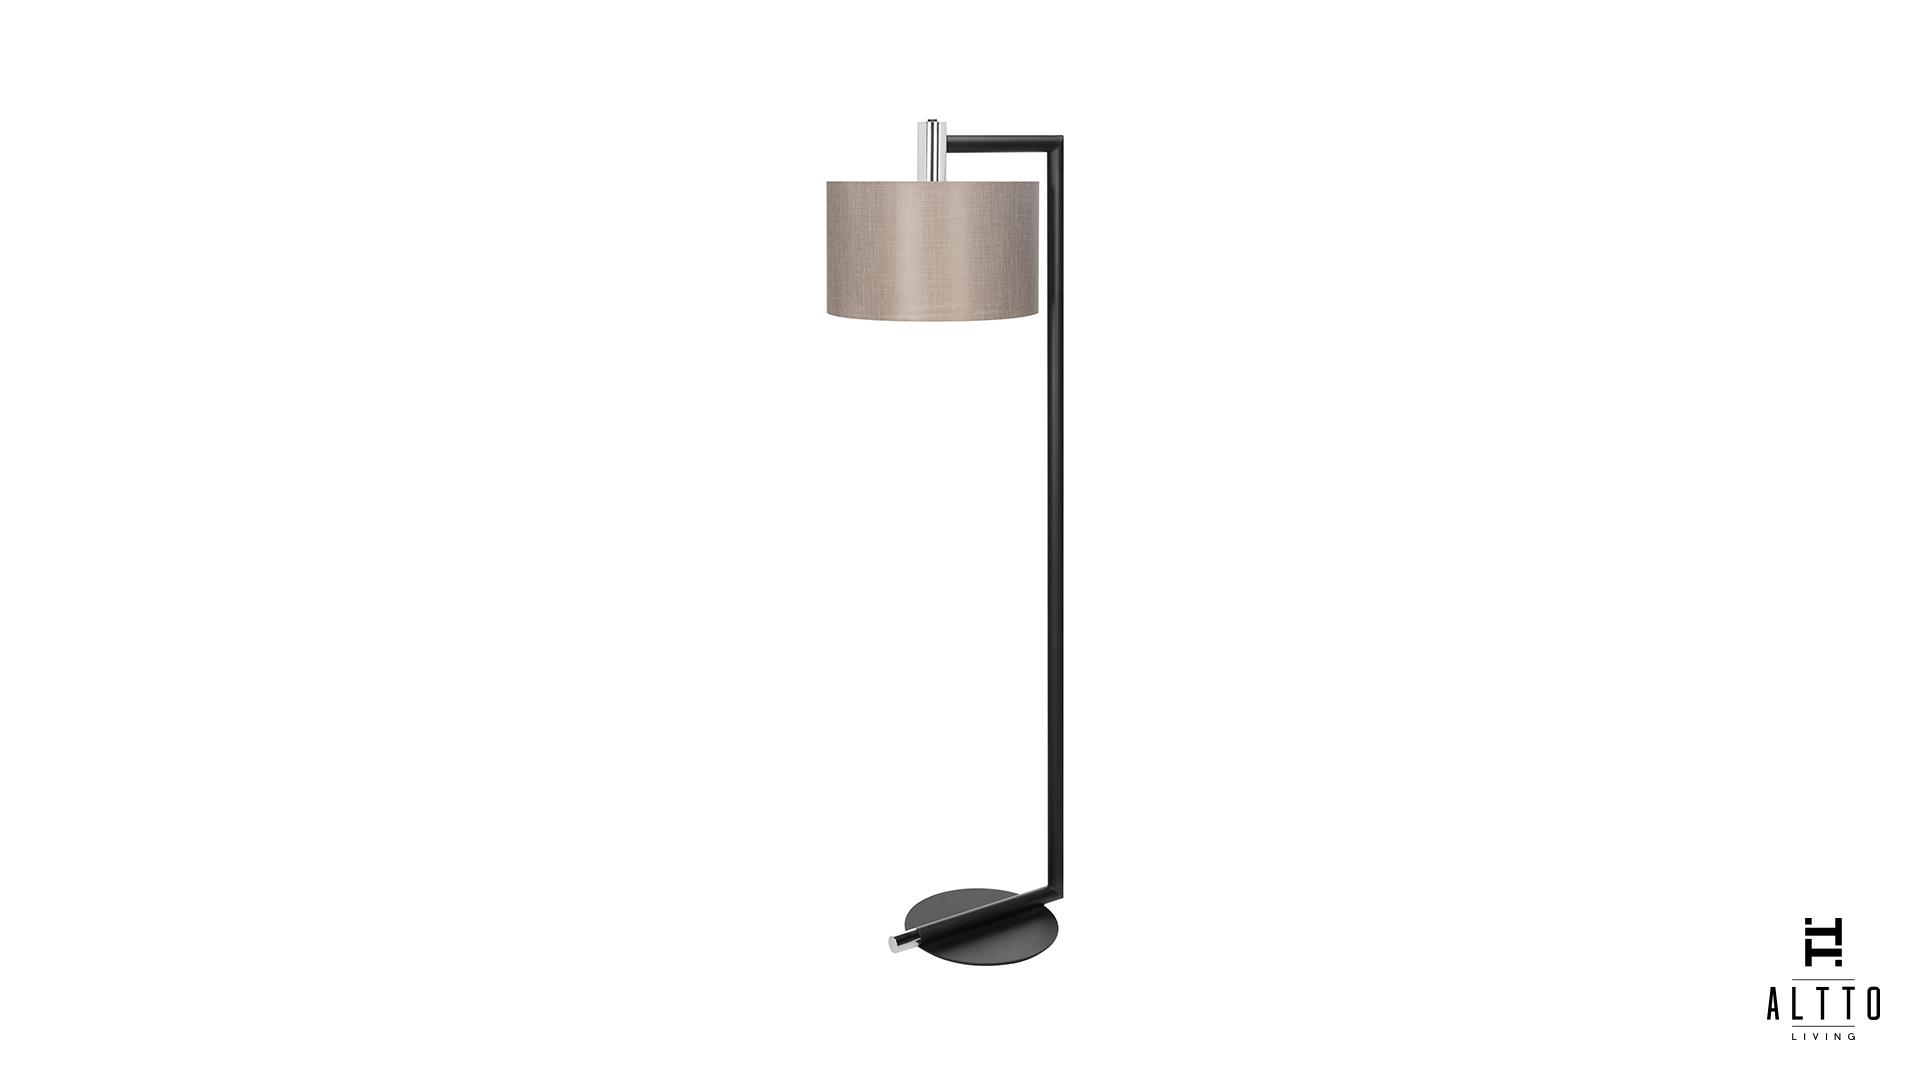 ALTTO | MARRAM Floor Lamp | Modern and cosmopolitan lighting range ...